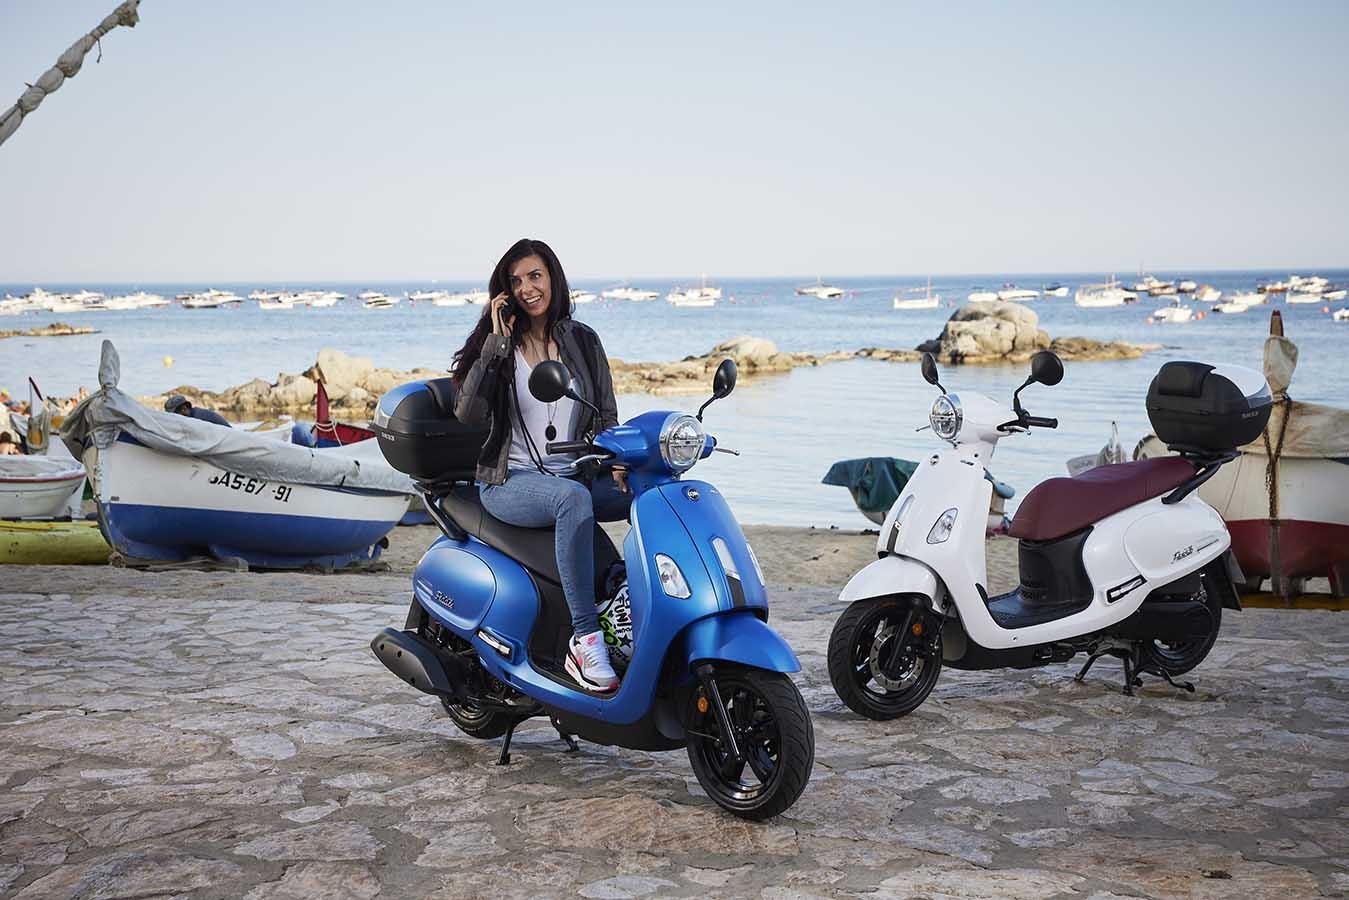 ropa de moto de verano para ir con scooter, sym fiddle 125, chaqueta de moto by city